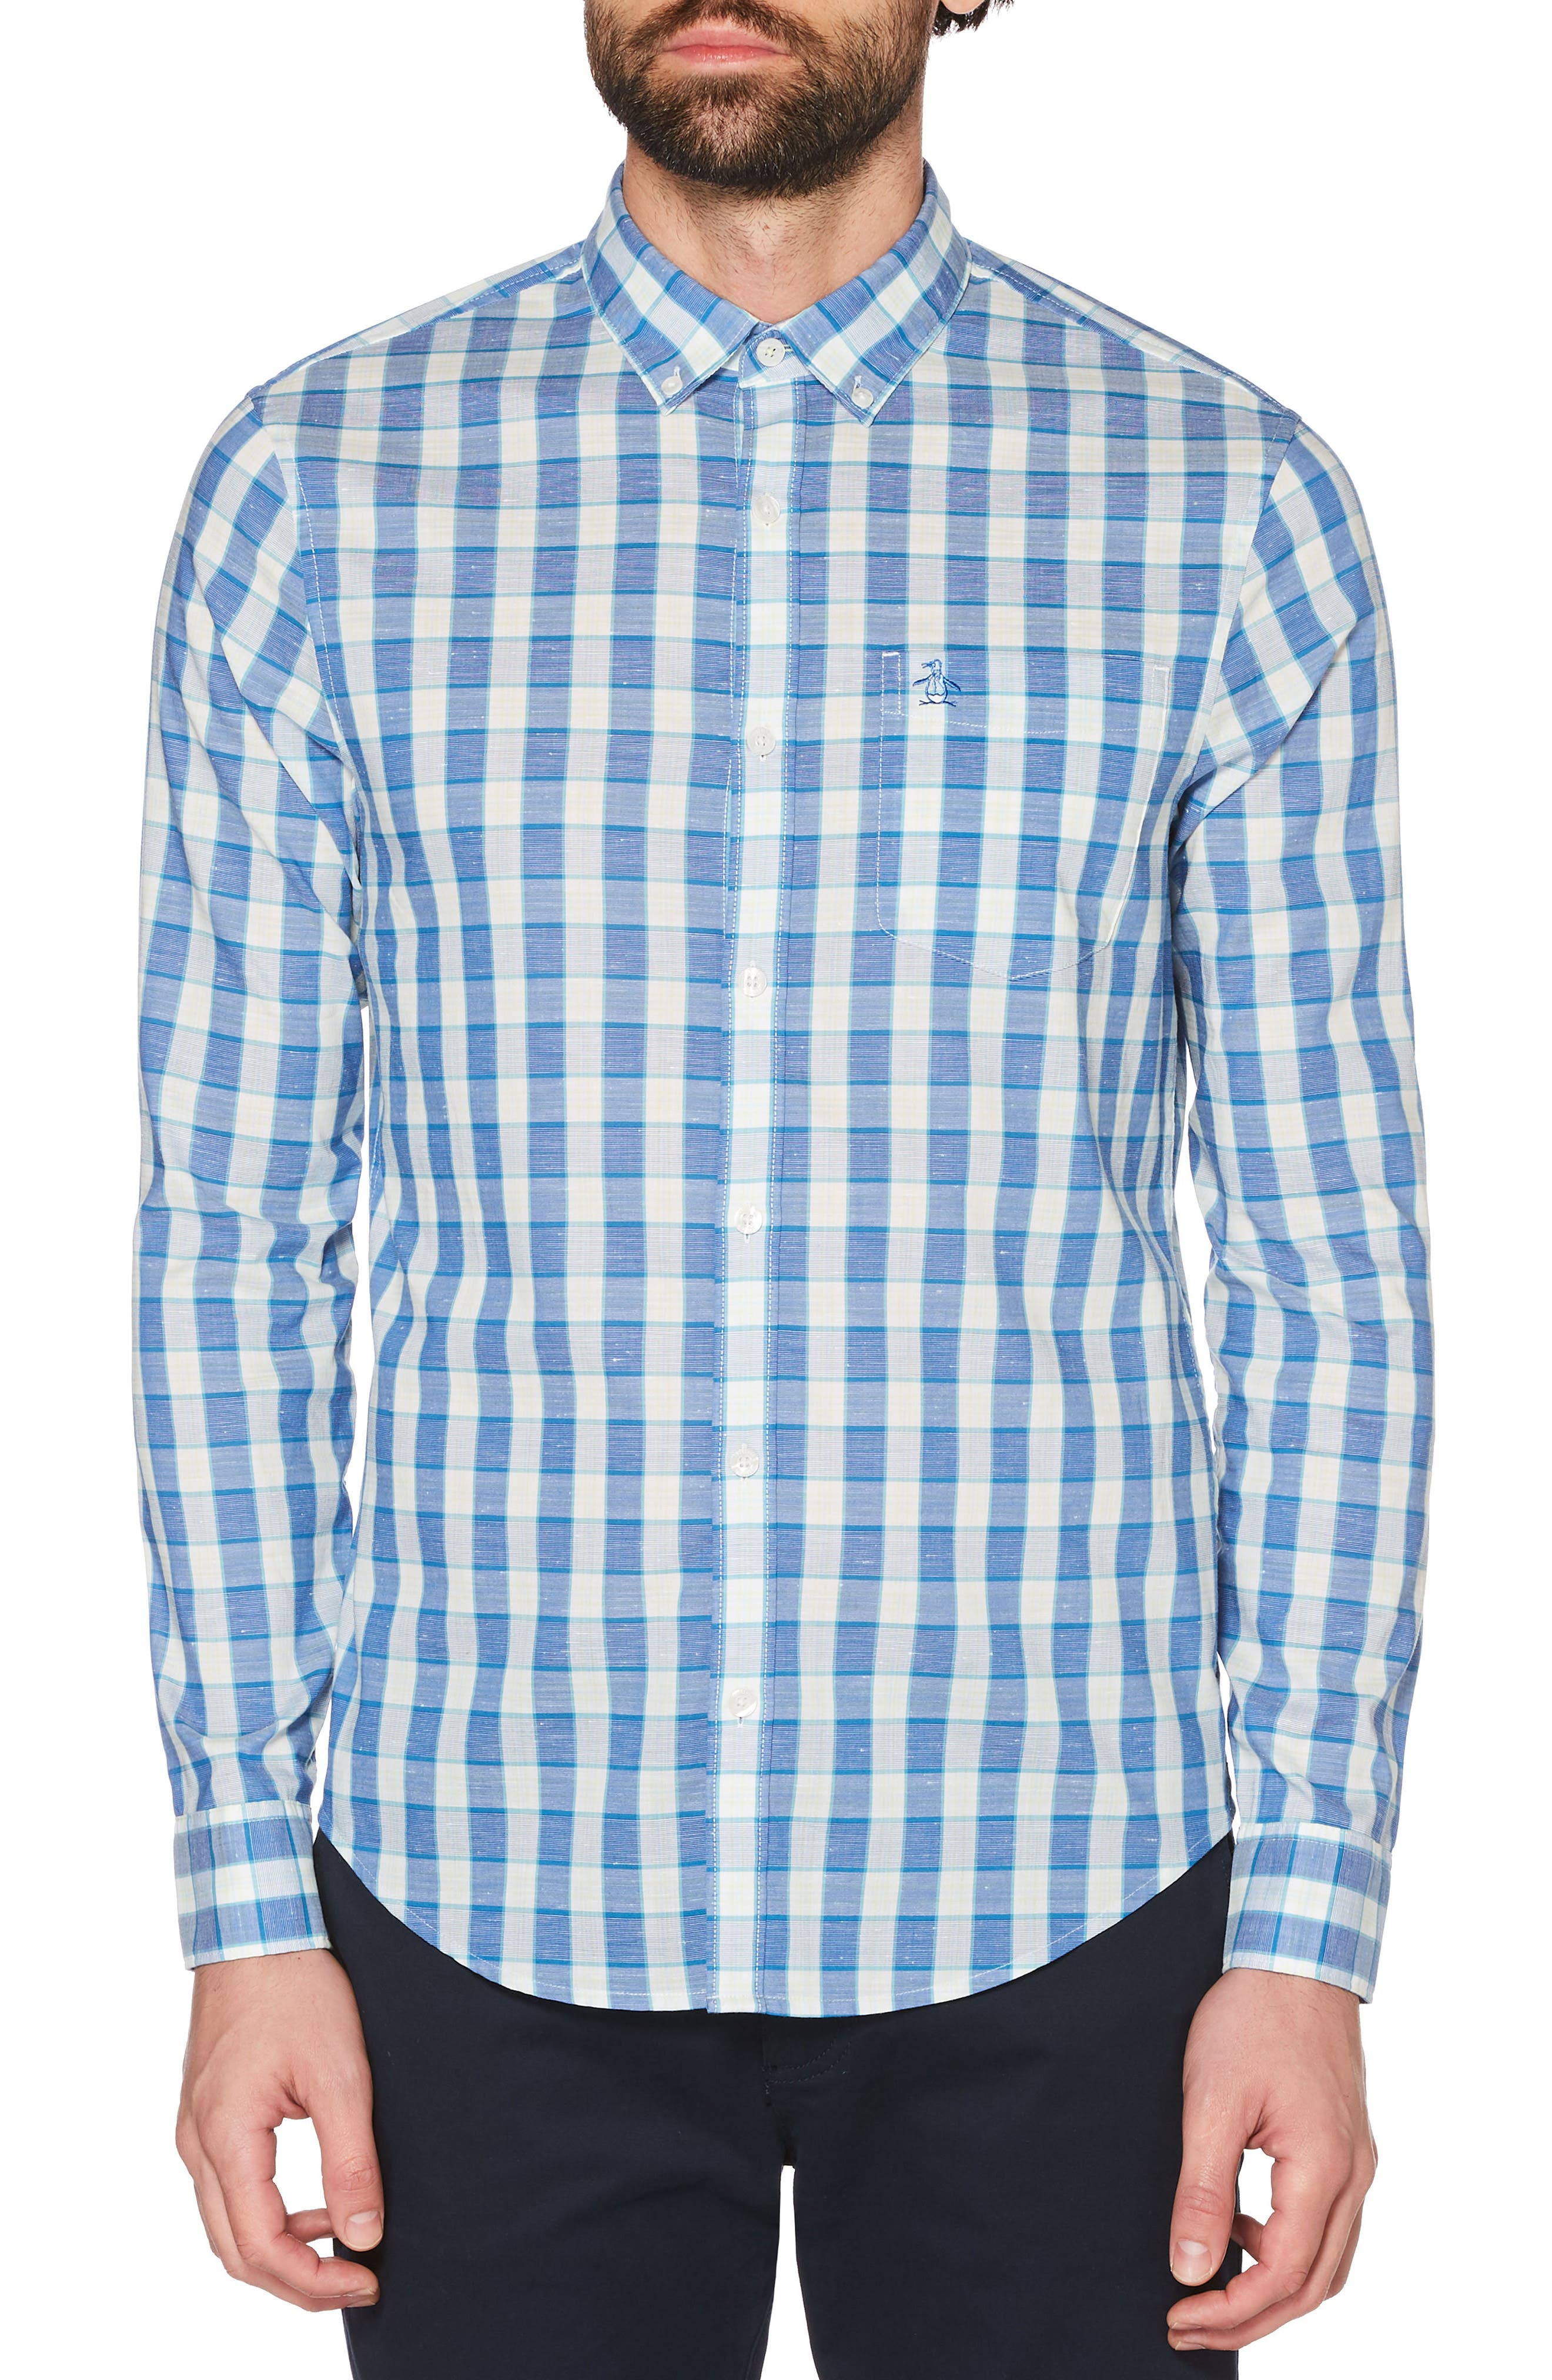 Nep Plaid Woven Shirt,                         Main,                         color, 462